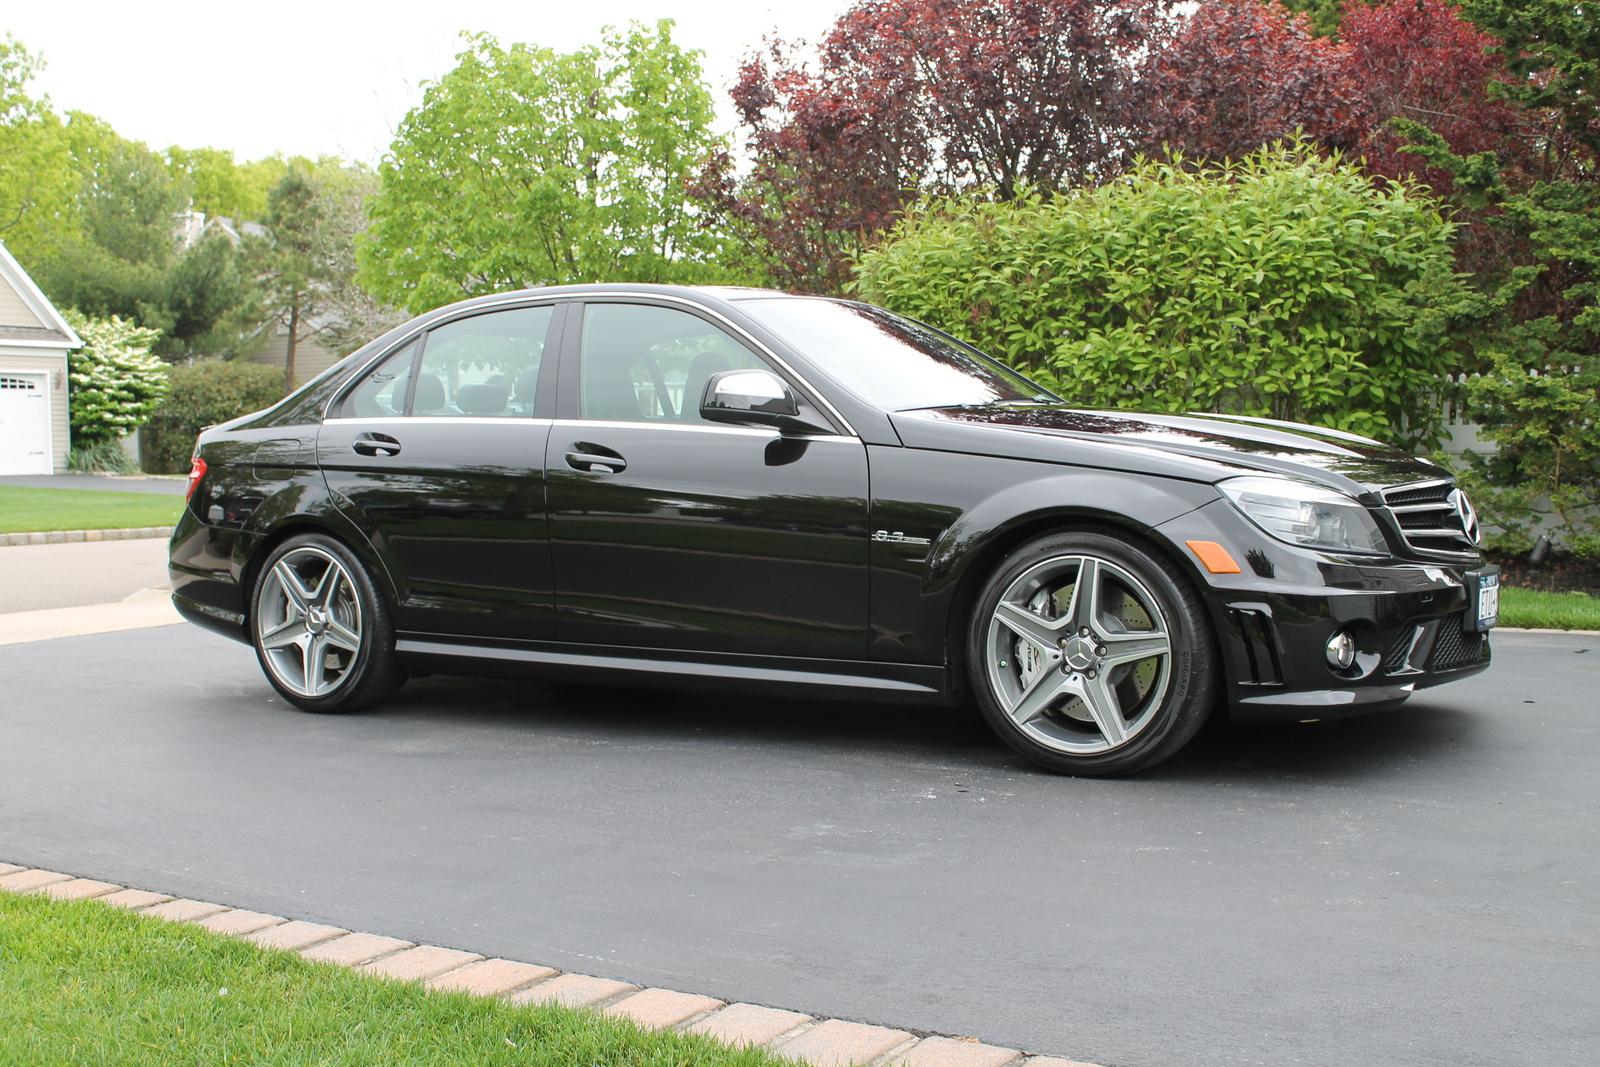 Used 2014 Audi A4 For Sale  CarGurus